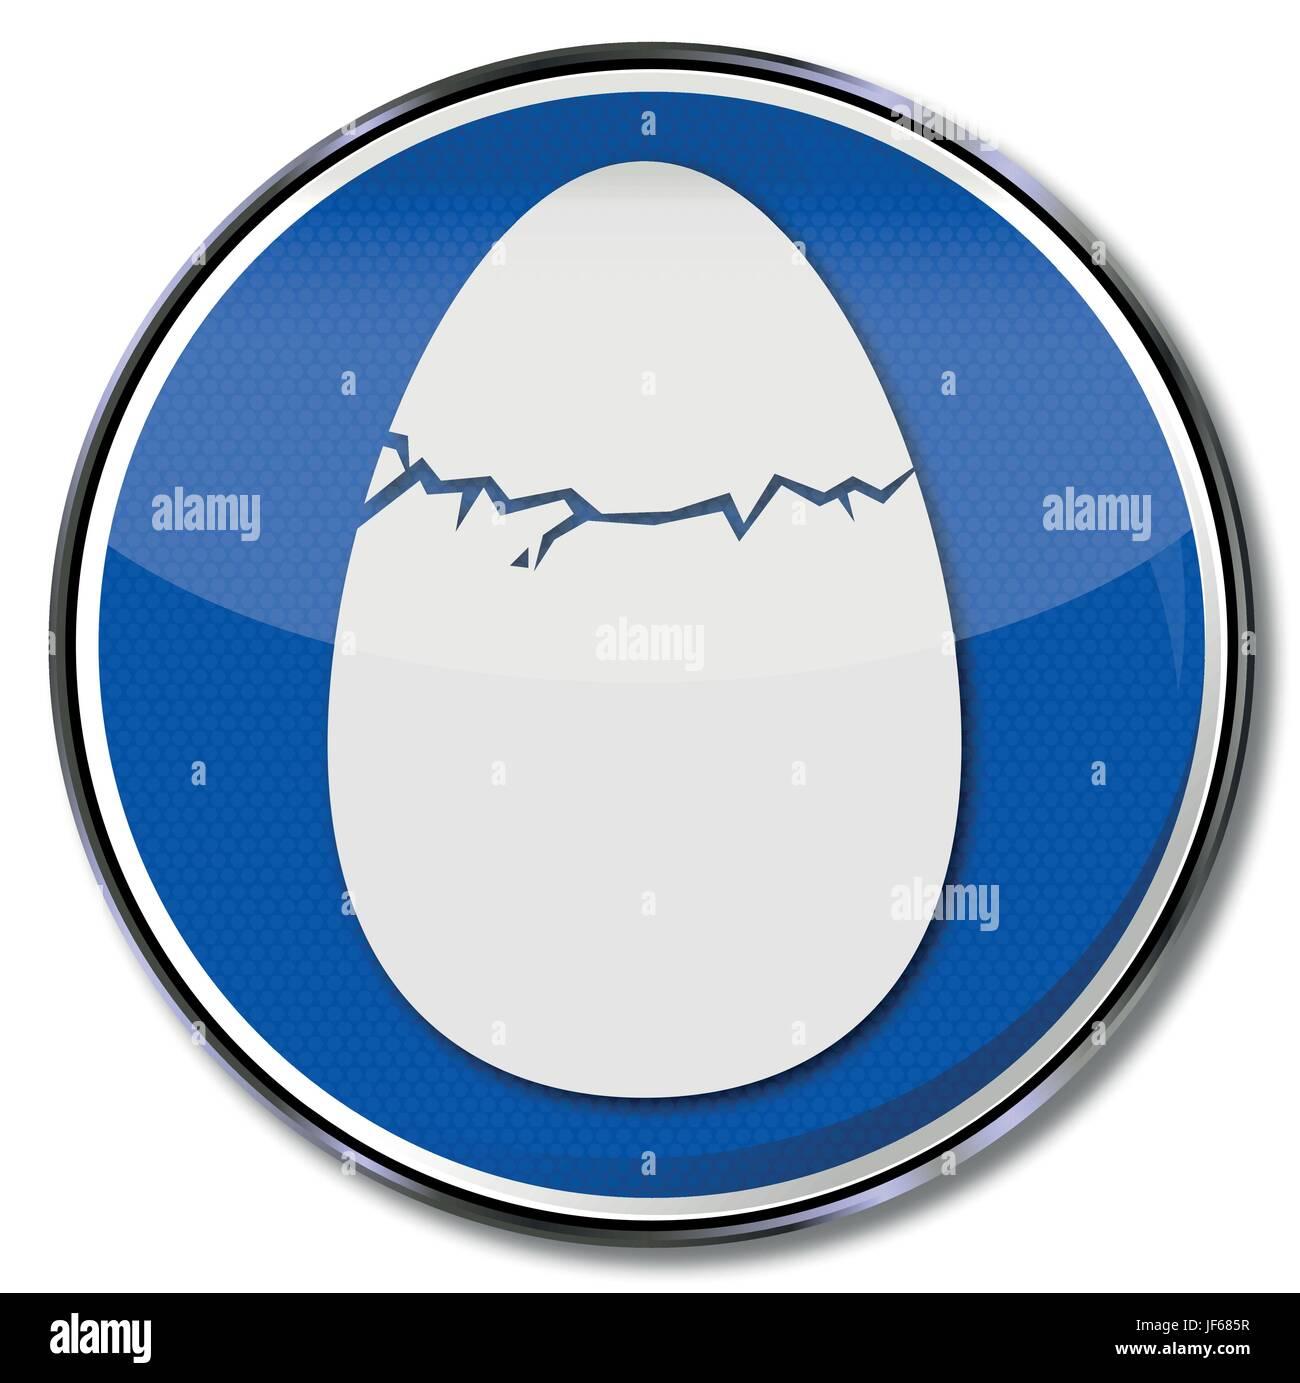 brood, egg, eggshell, eggs, result, hatch, enthusiasm, amusement, enjoyment, Stock Vector